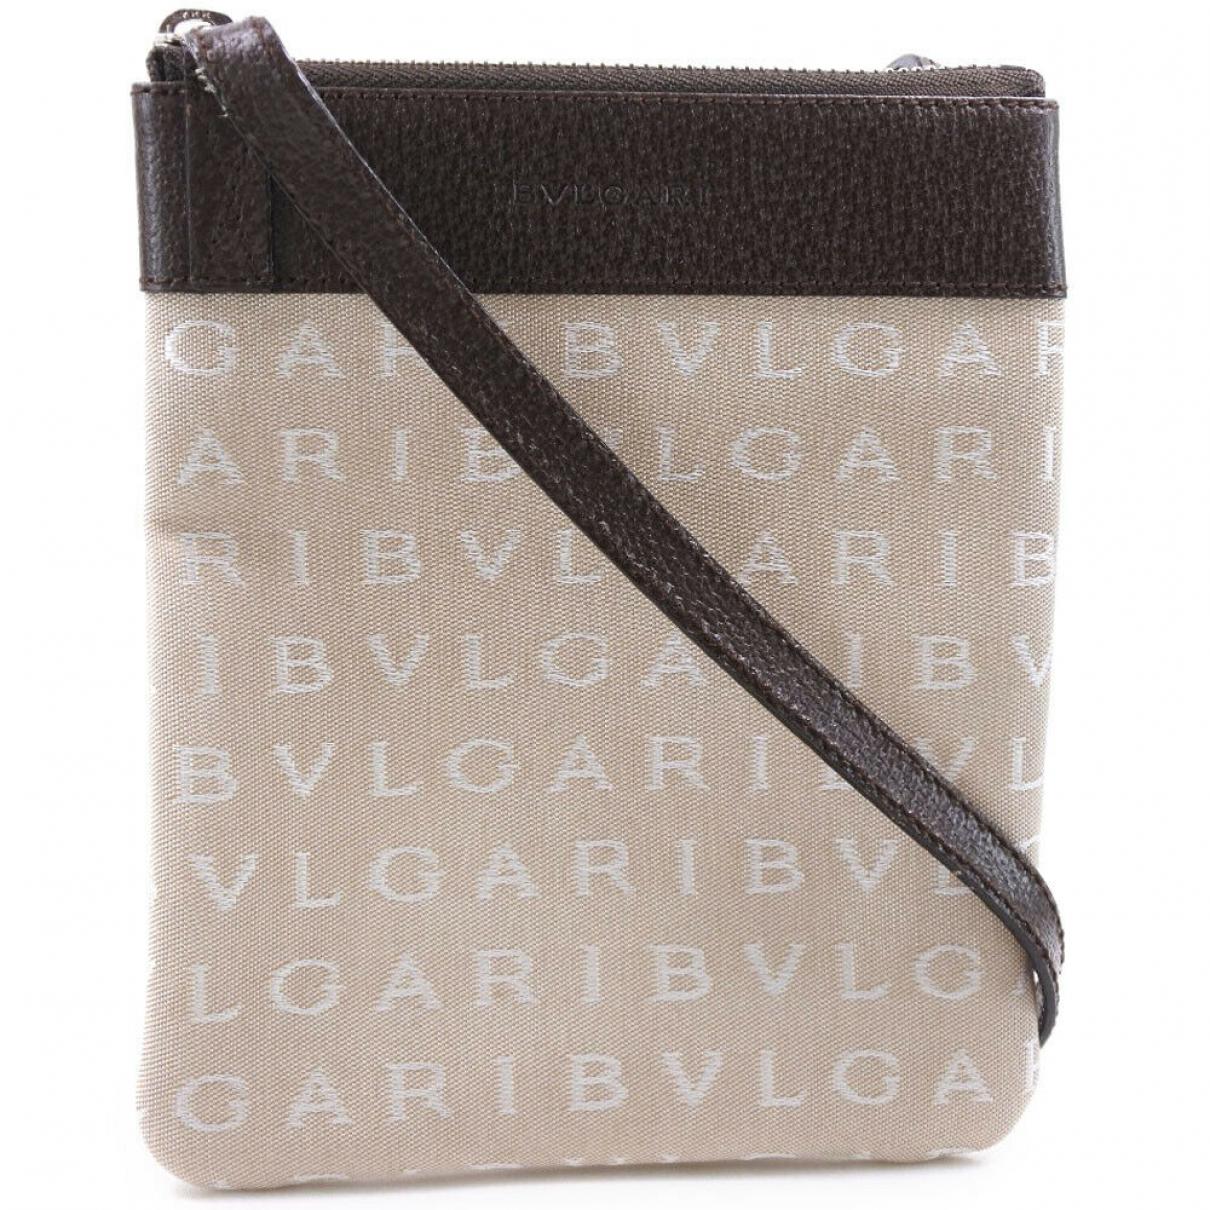 Bvlgari \N Handtasche in Leder